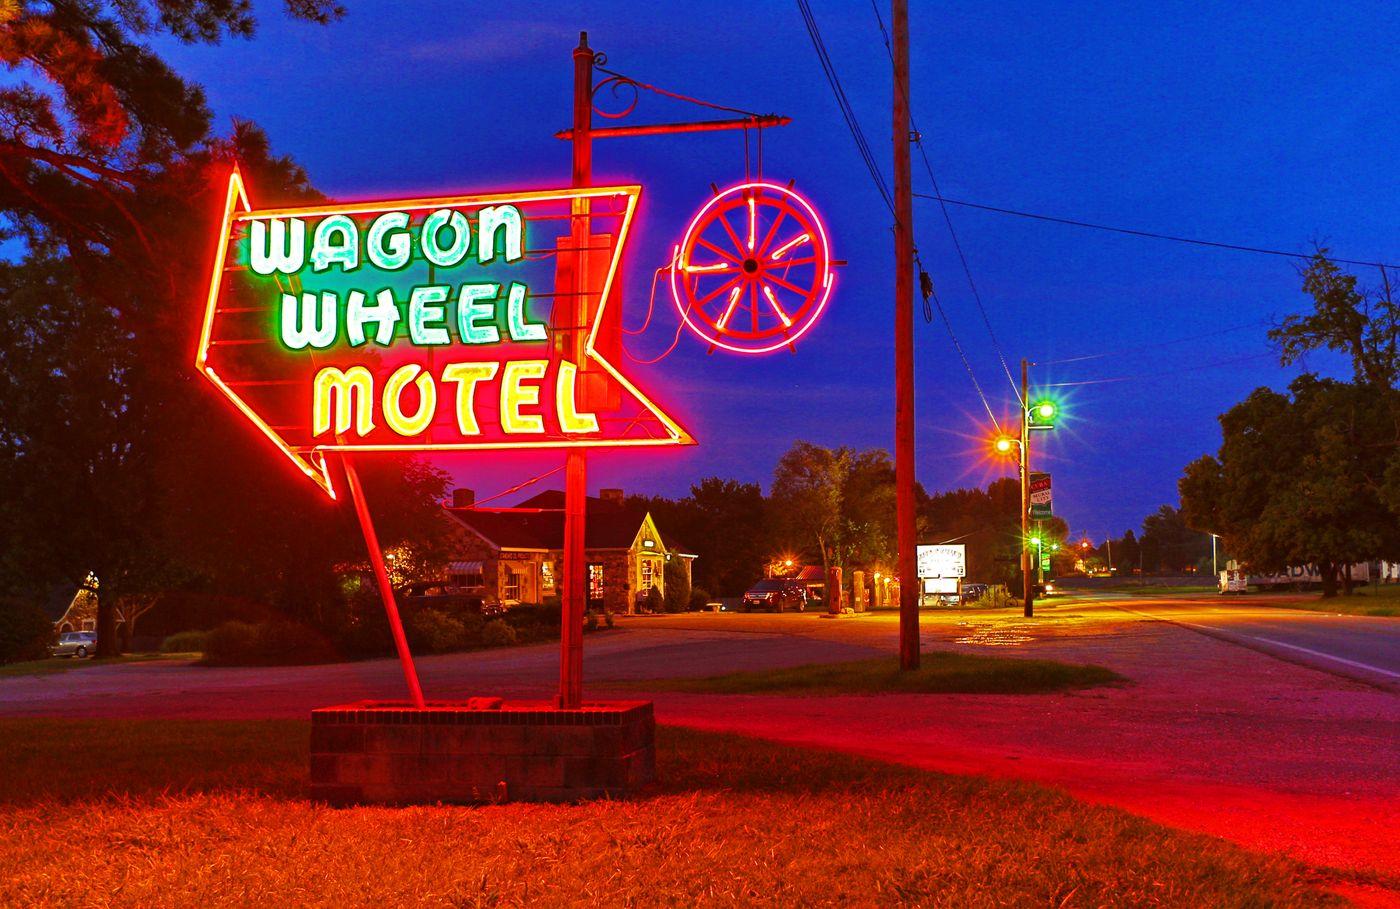 Route 66 Neon 2016_10_03 3000 copy.jpg